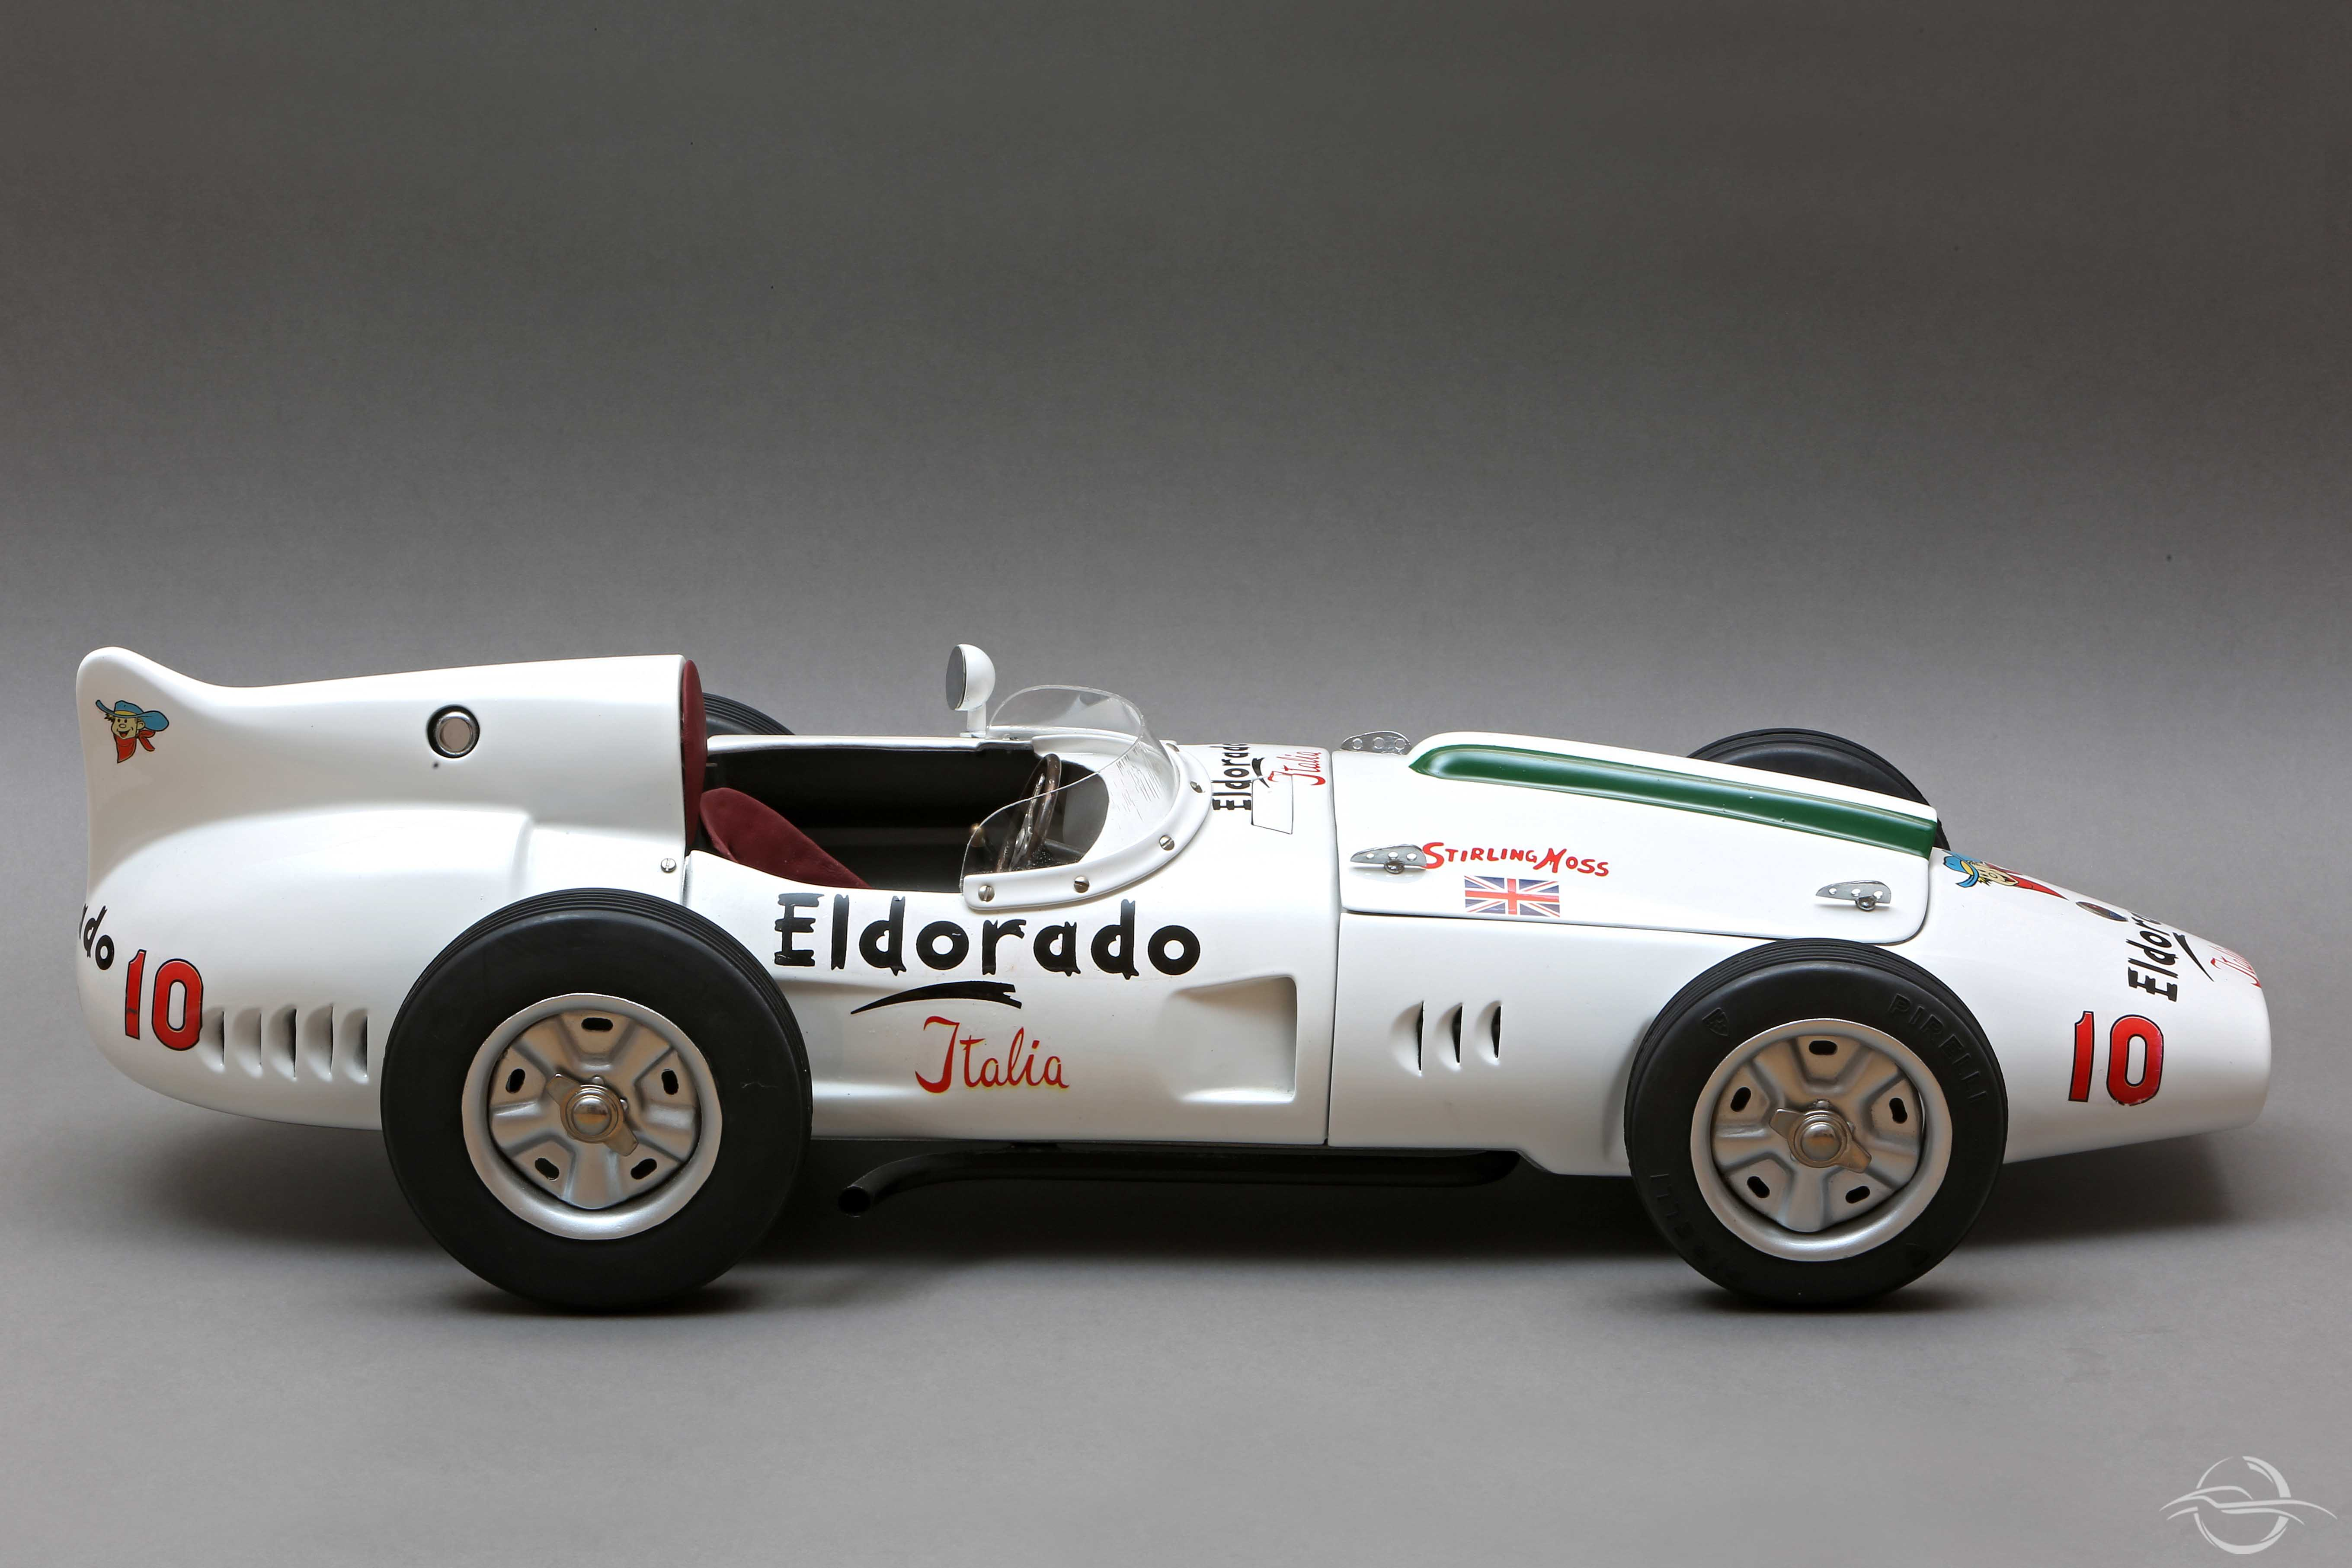 Maserati Eldorado Intera 1